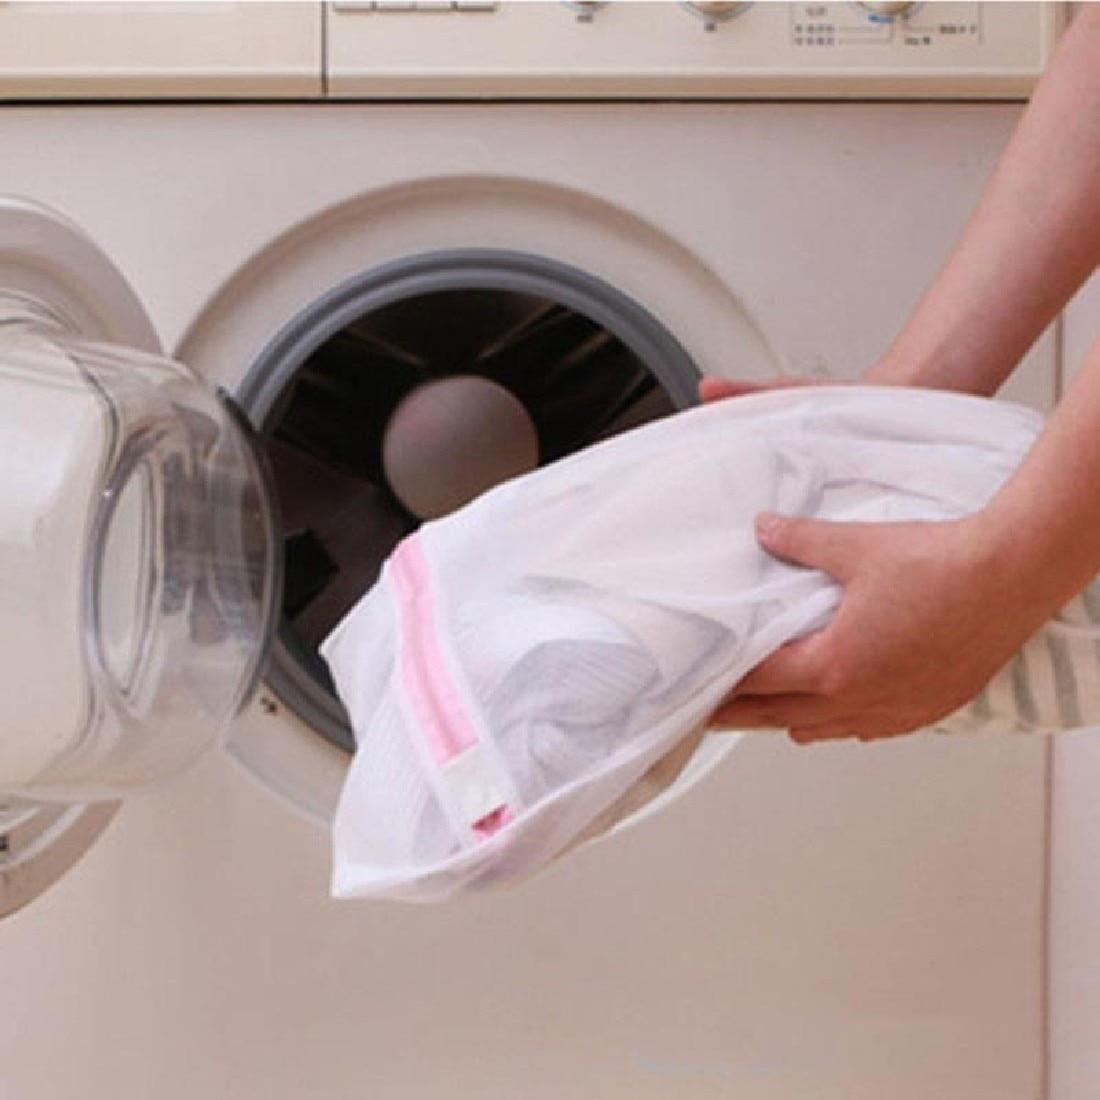 1Pc 30cmx40cm Zippered Foldable Nylon Laundry Bag Bra Socks Underwear Clothes Washing Machine Protection Net Mesh Bags